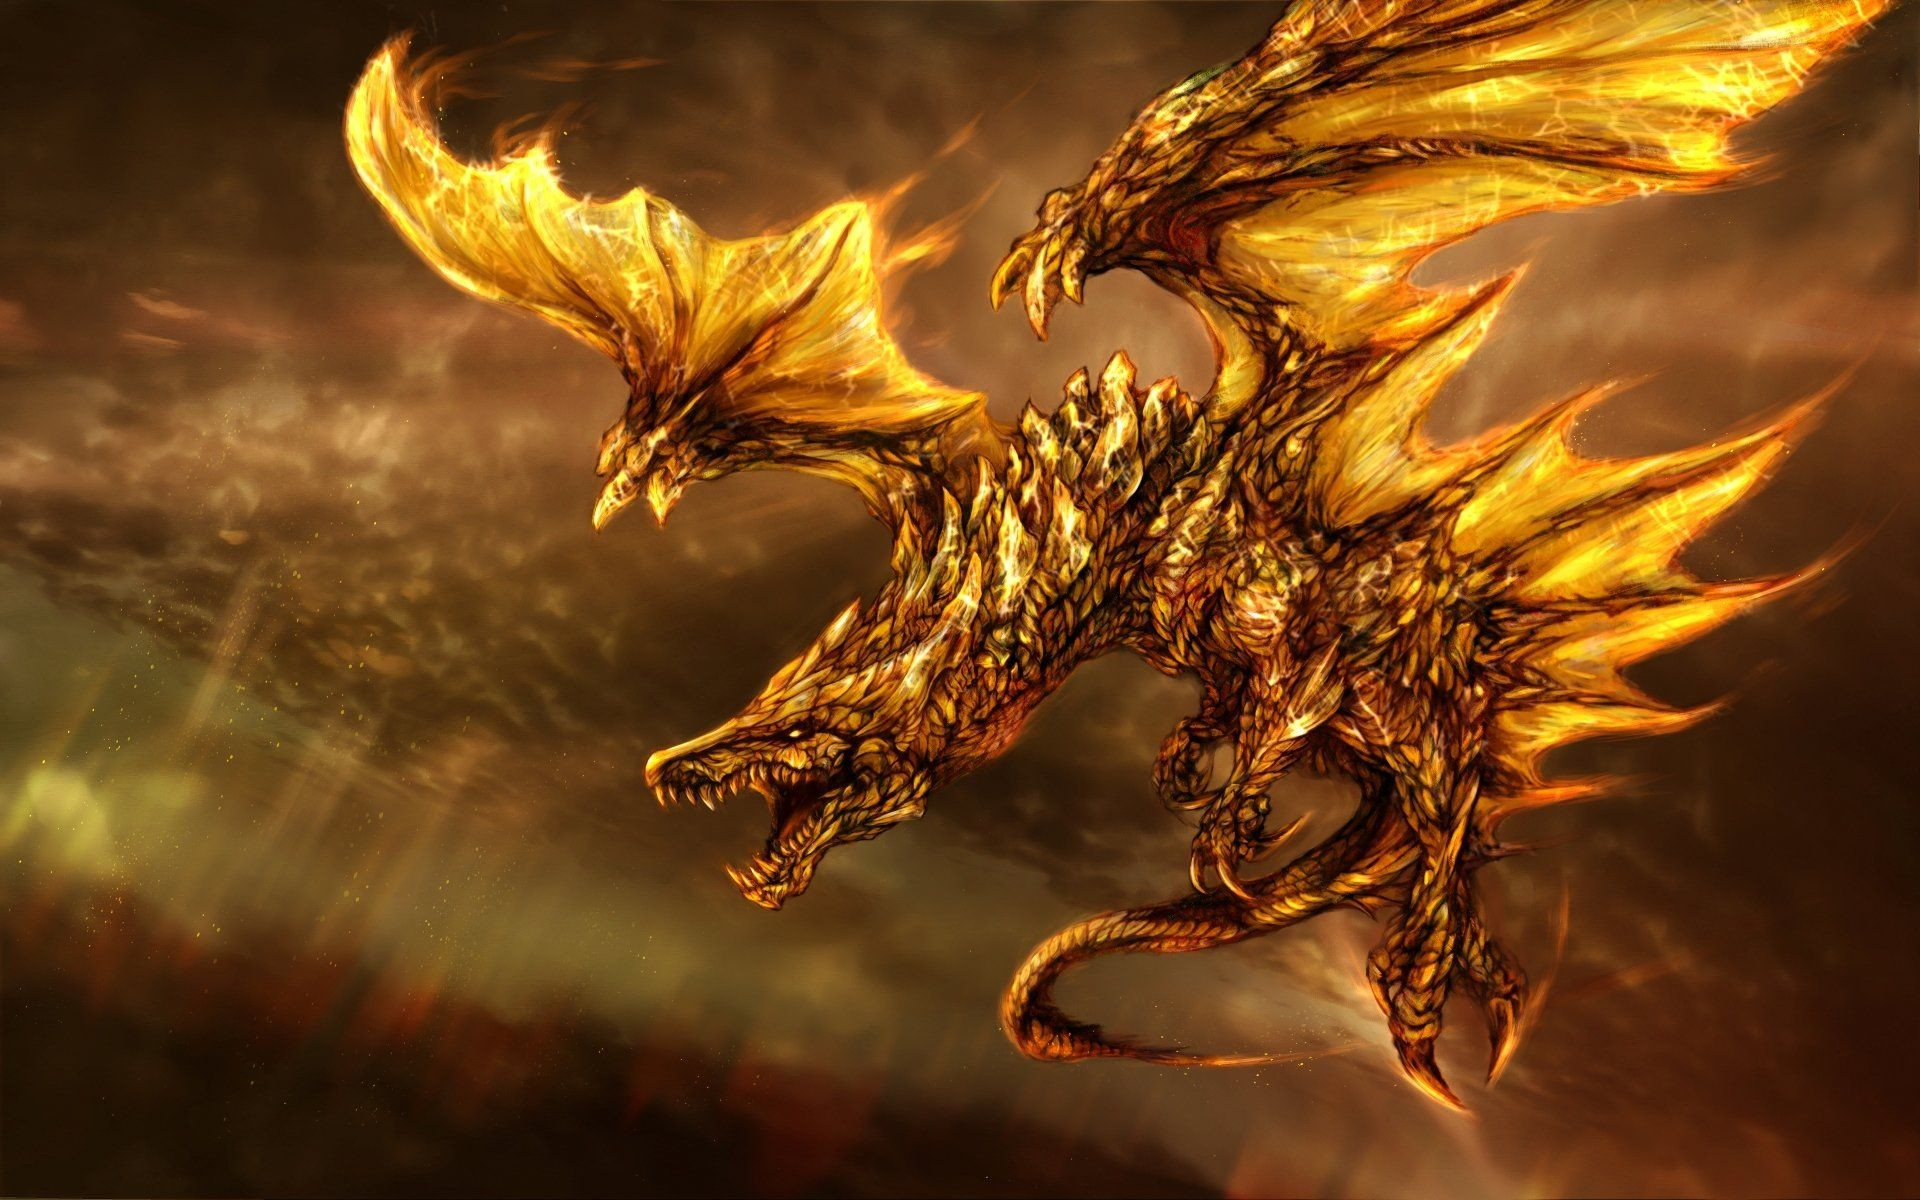 dragon screensavers and wallpaper 66 images